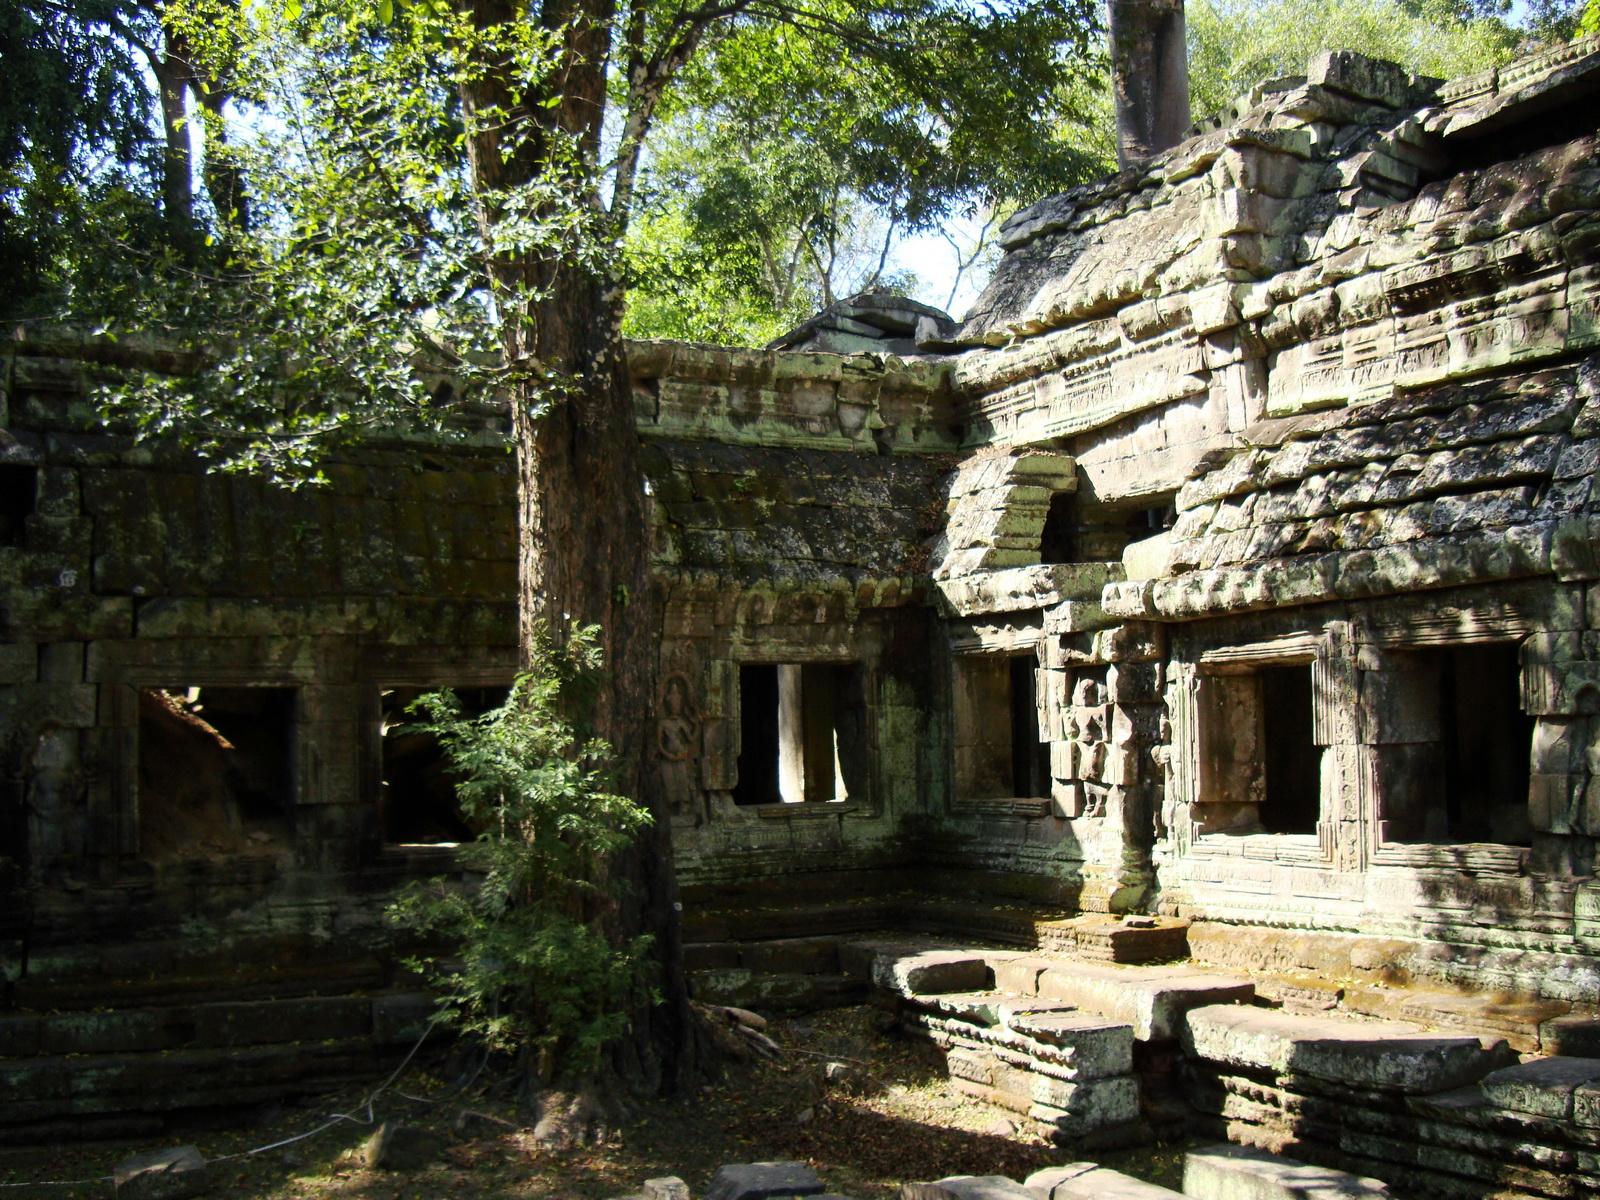 Ta Prohm Tomb Raider Bayon architecture Gopura 4 East entrance 08